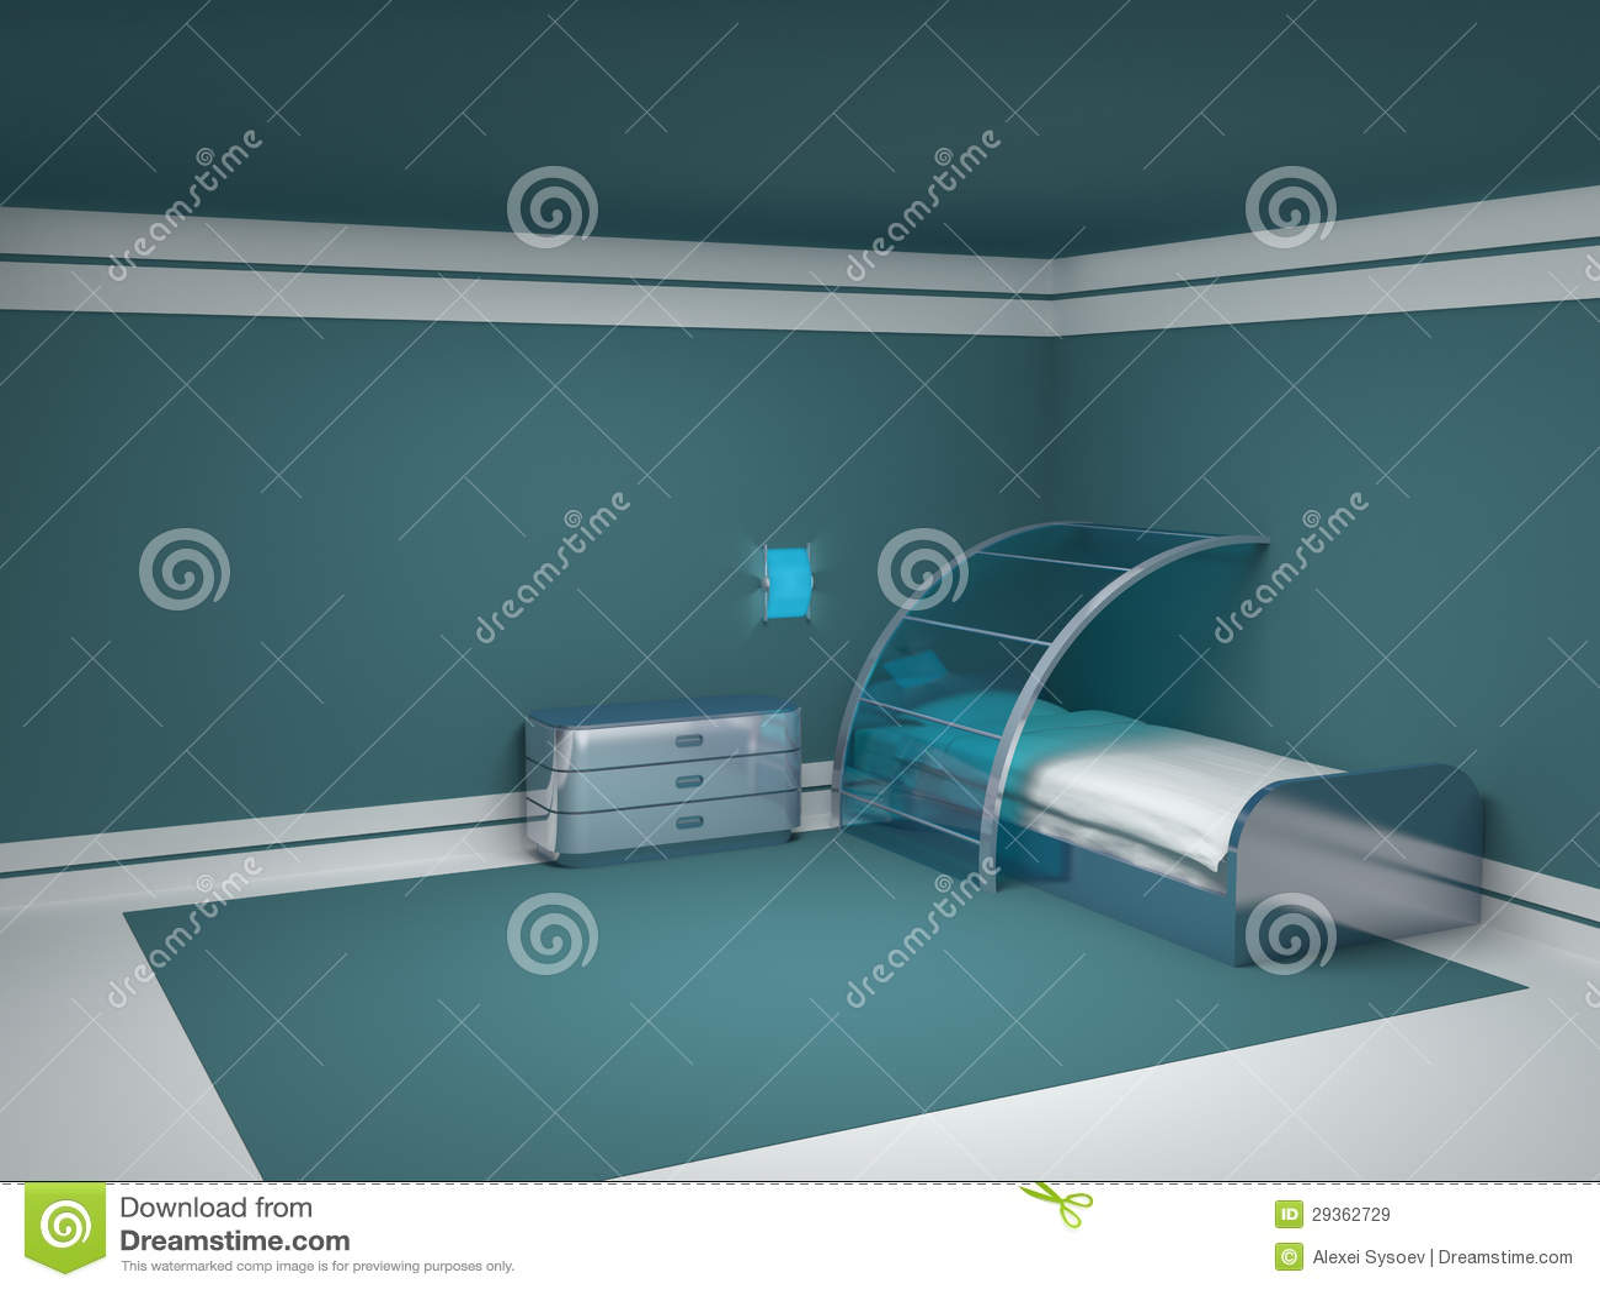 futuristic bedroom stock photo - image: 14984700